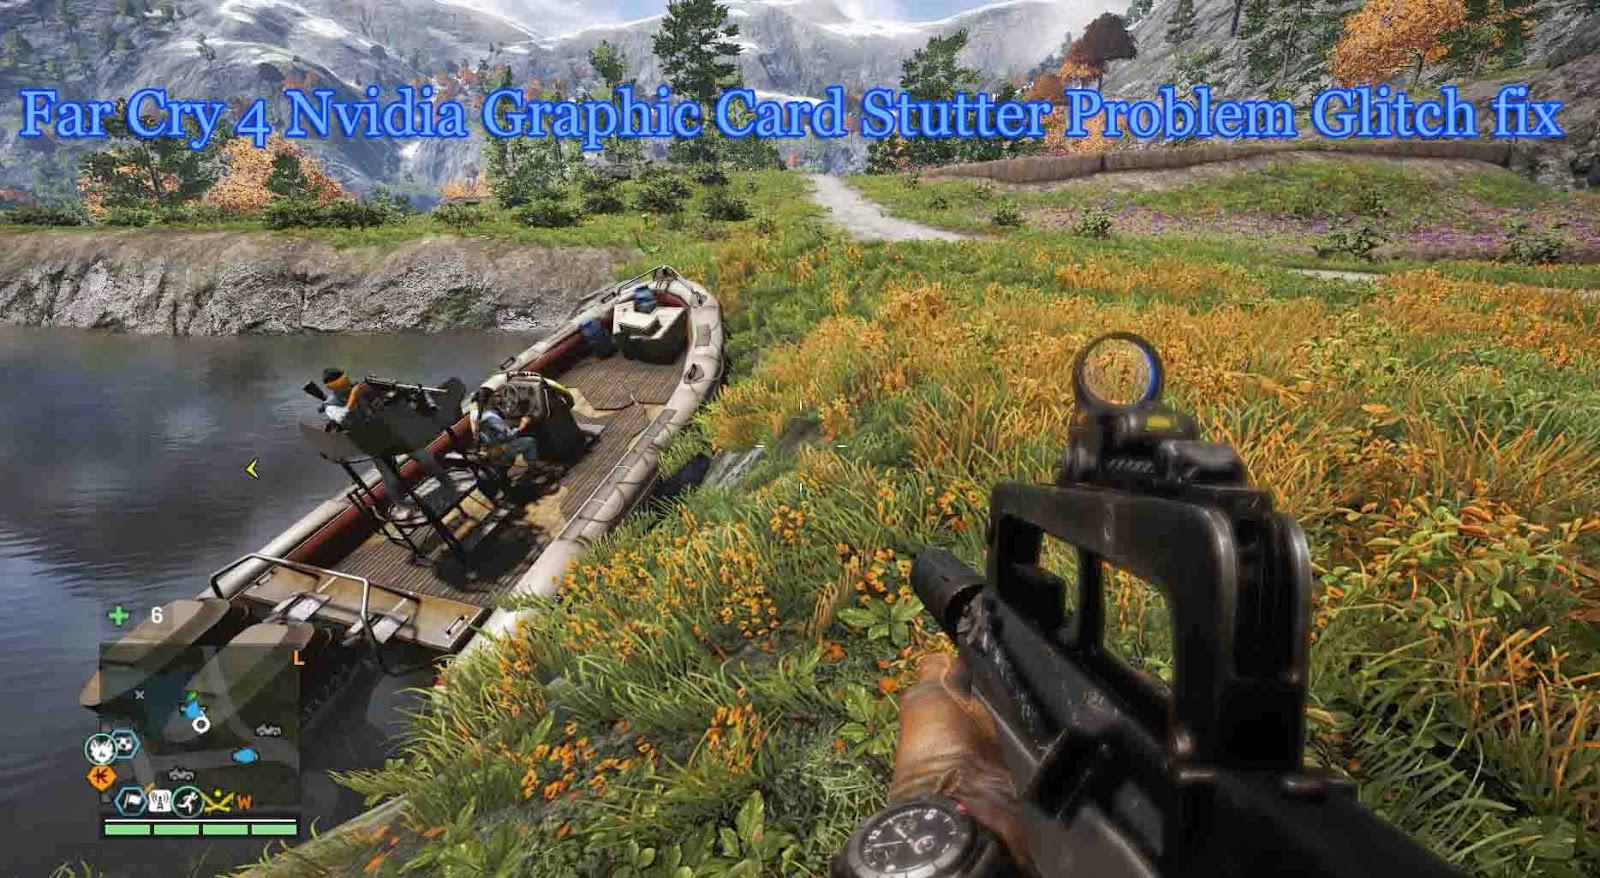 Far Cry 4 Nvidia Graphic Card Stutter Problem fix